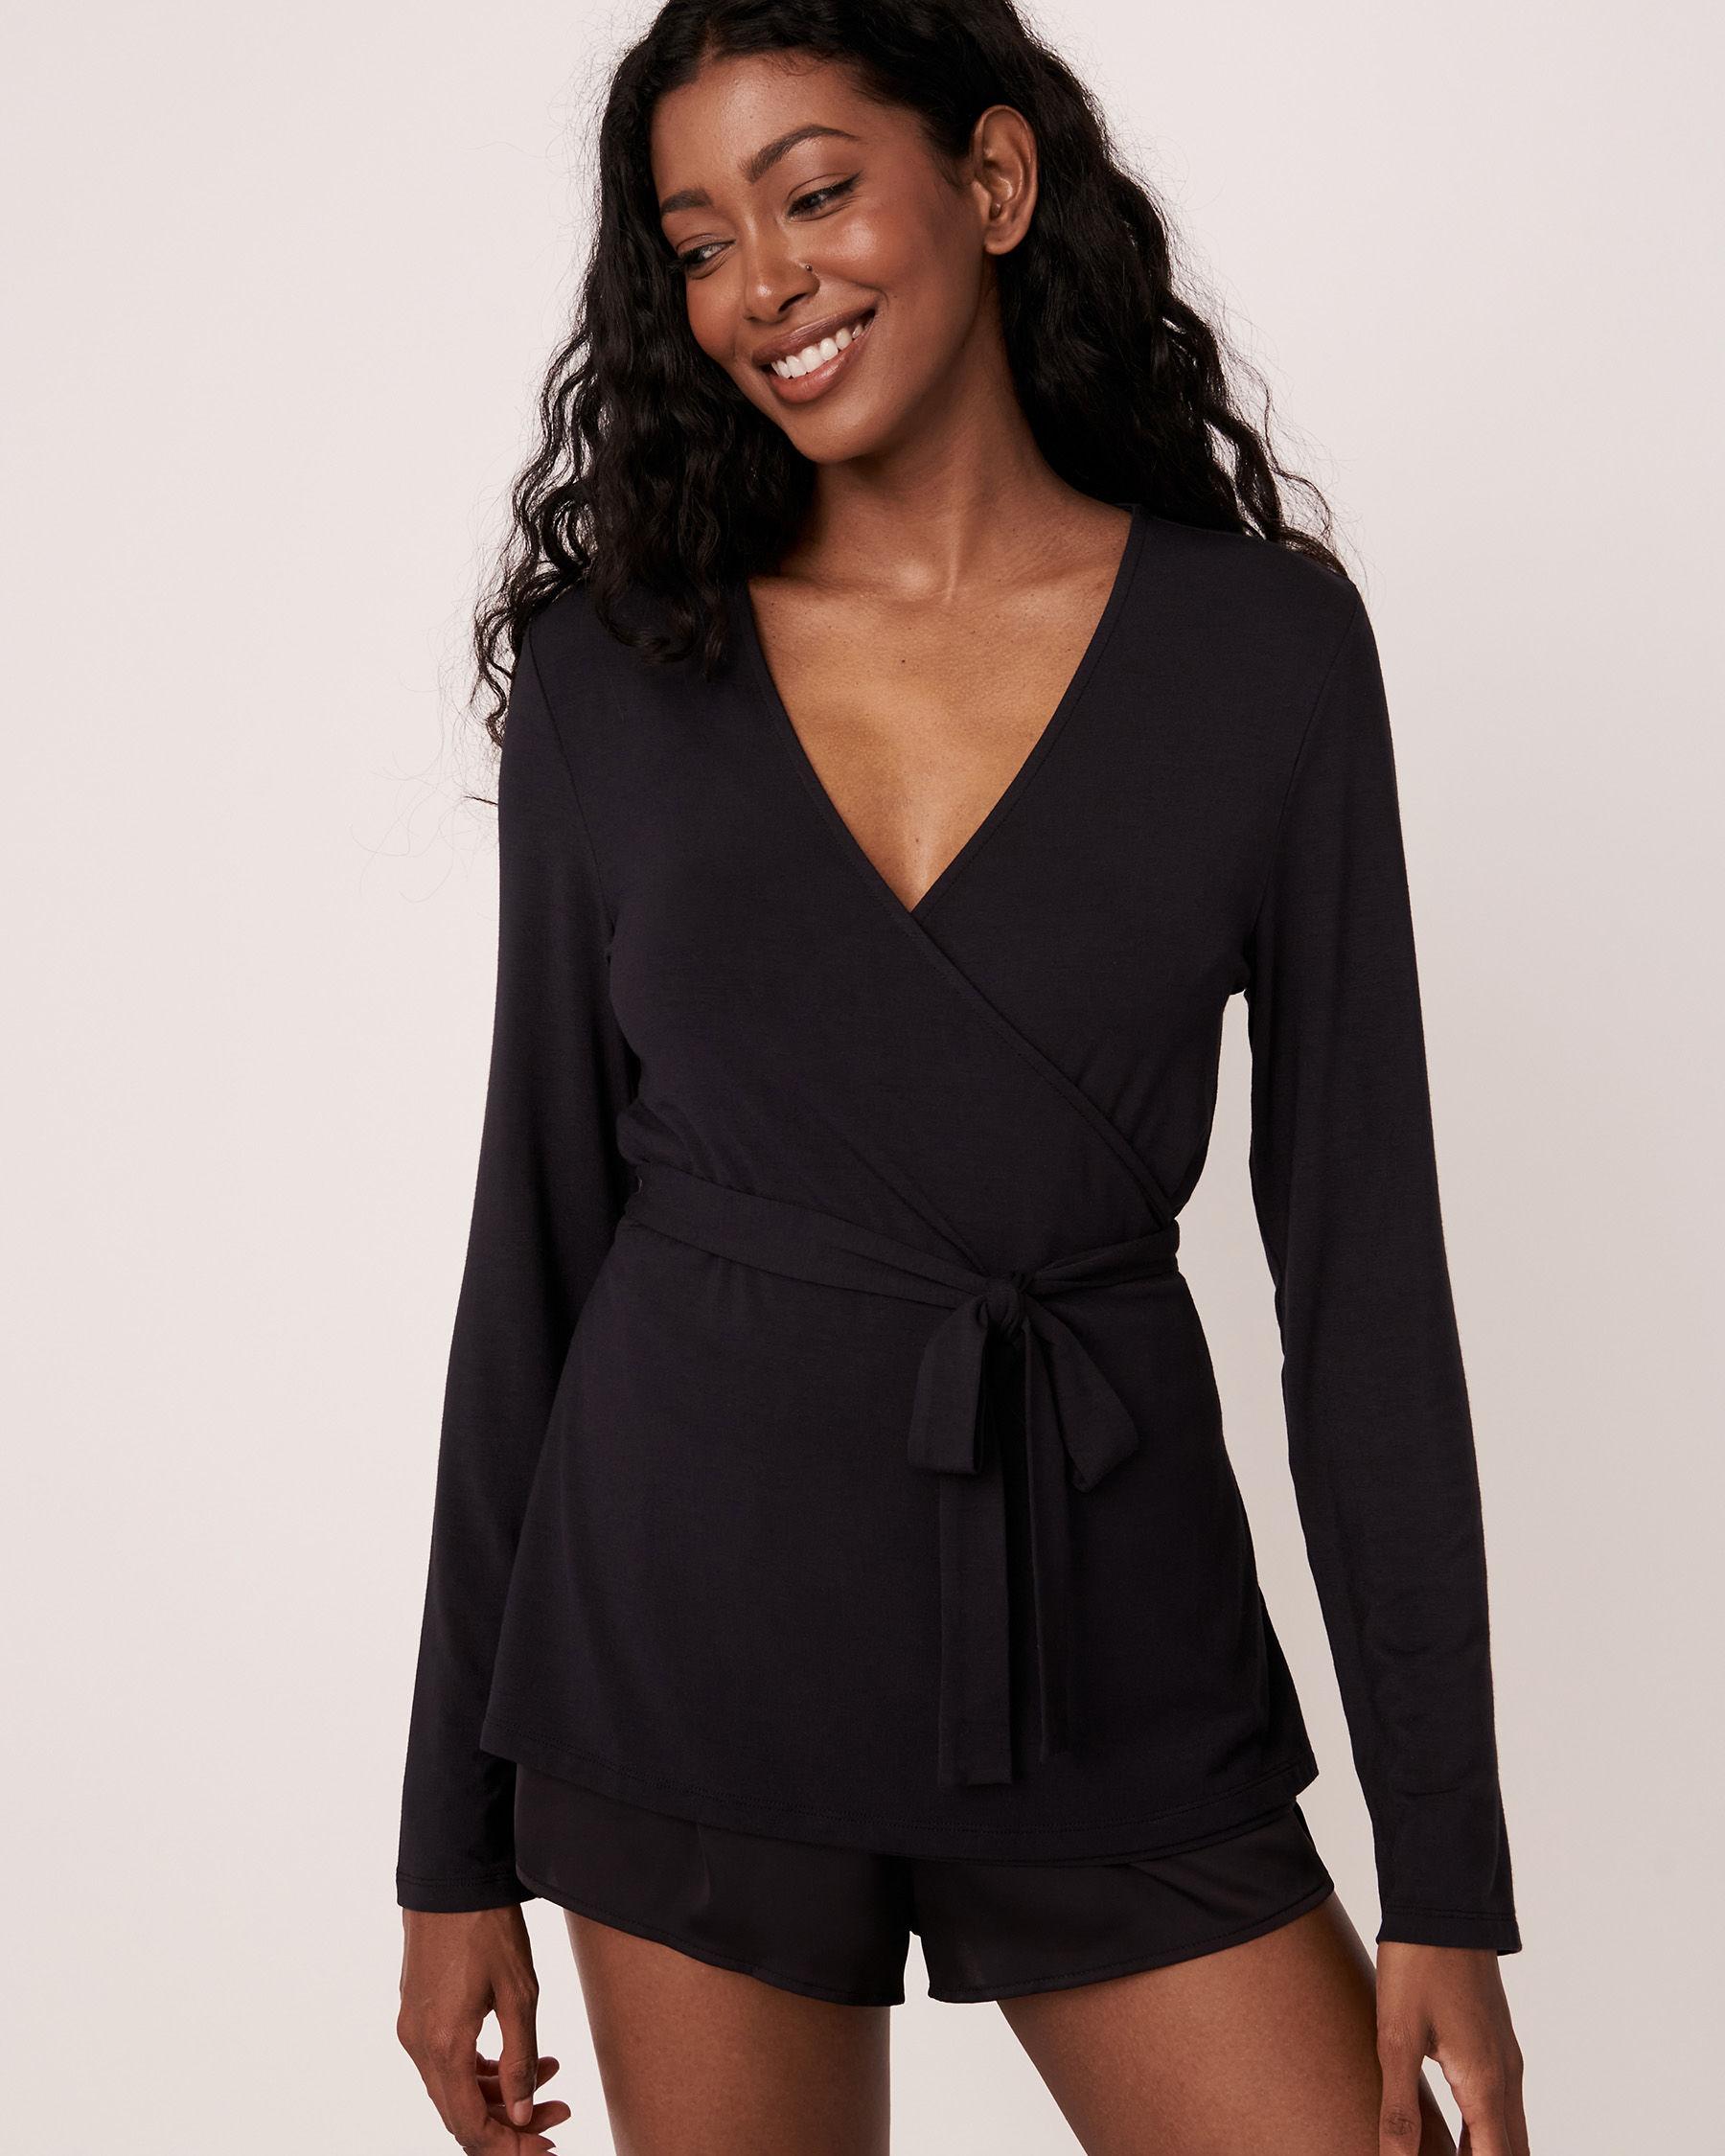 LA VIE EN ROSE Modal Wrap Over Long Sleeve Shirt Black 40100157 - View2